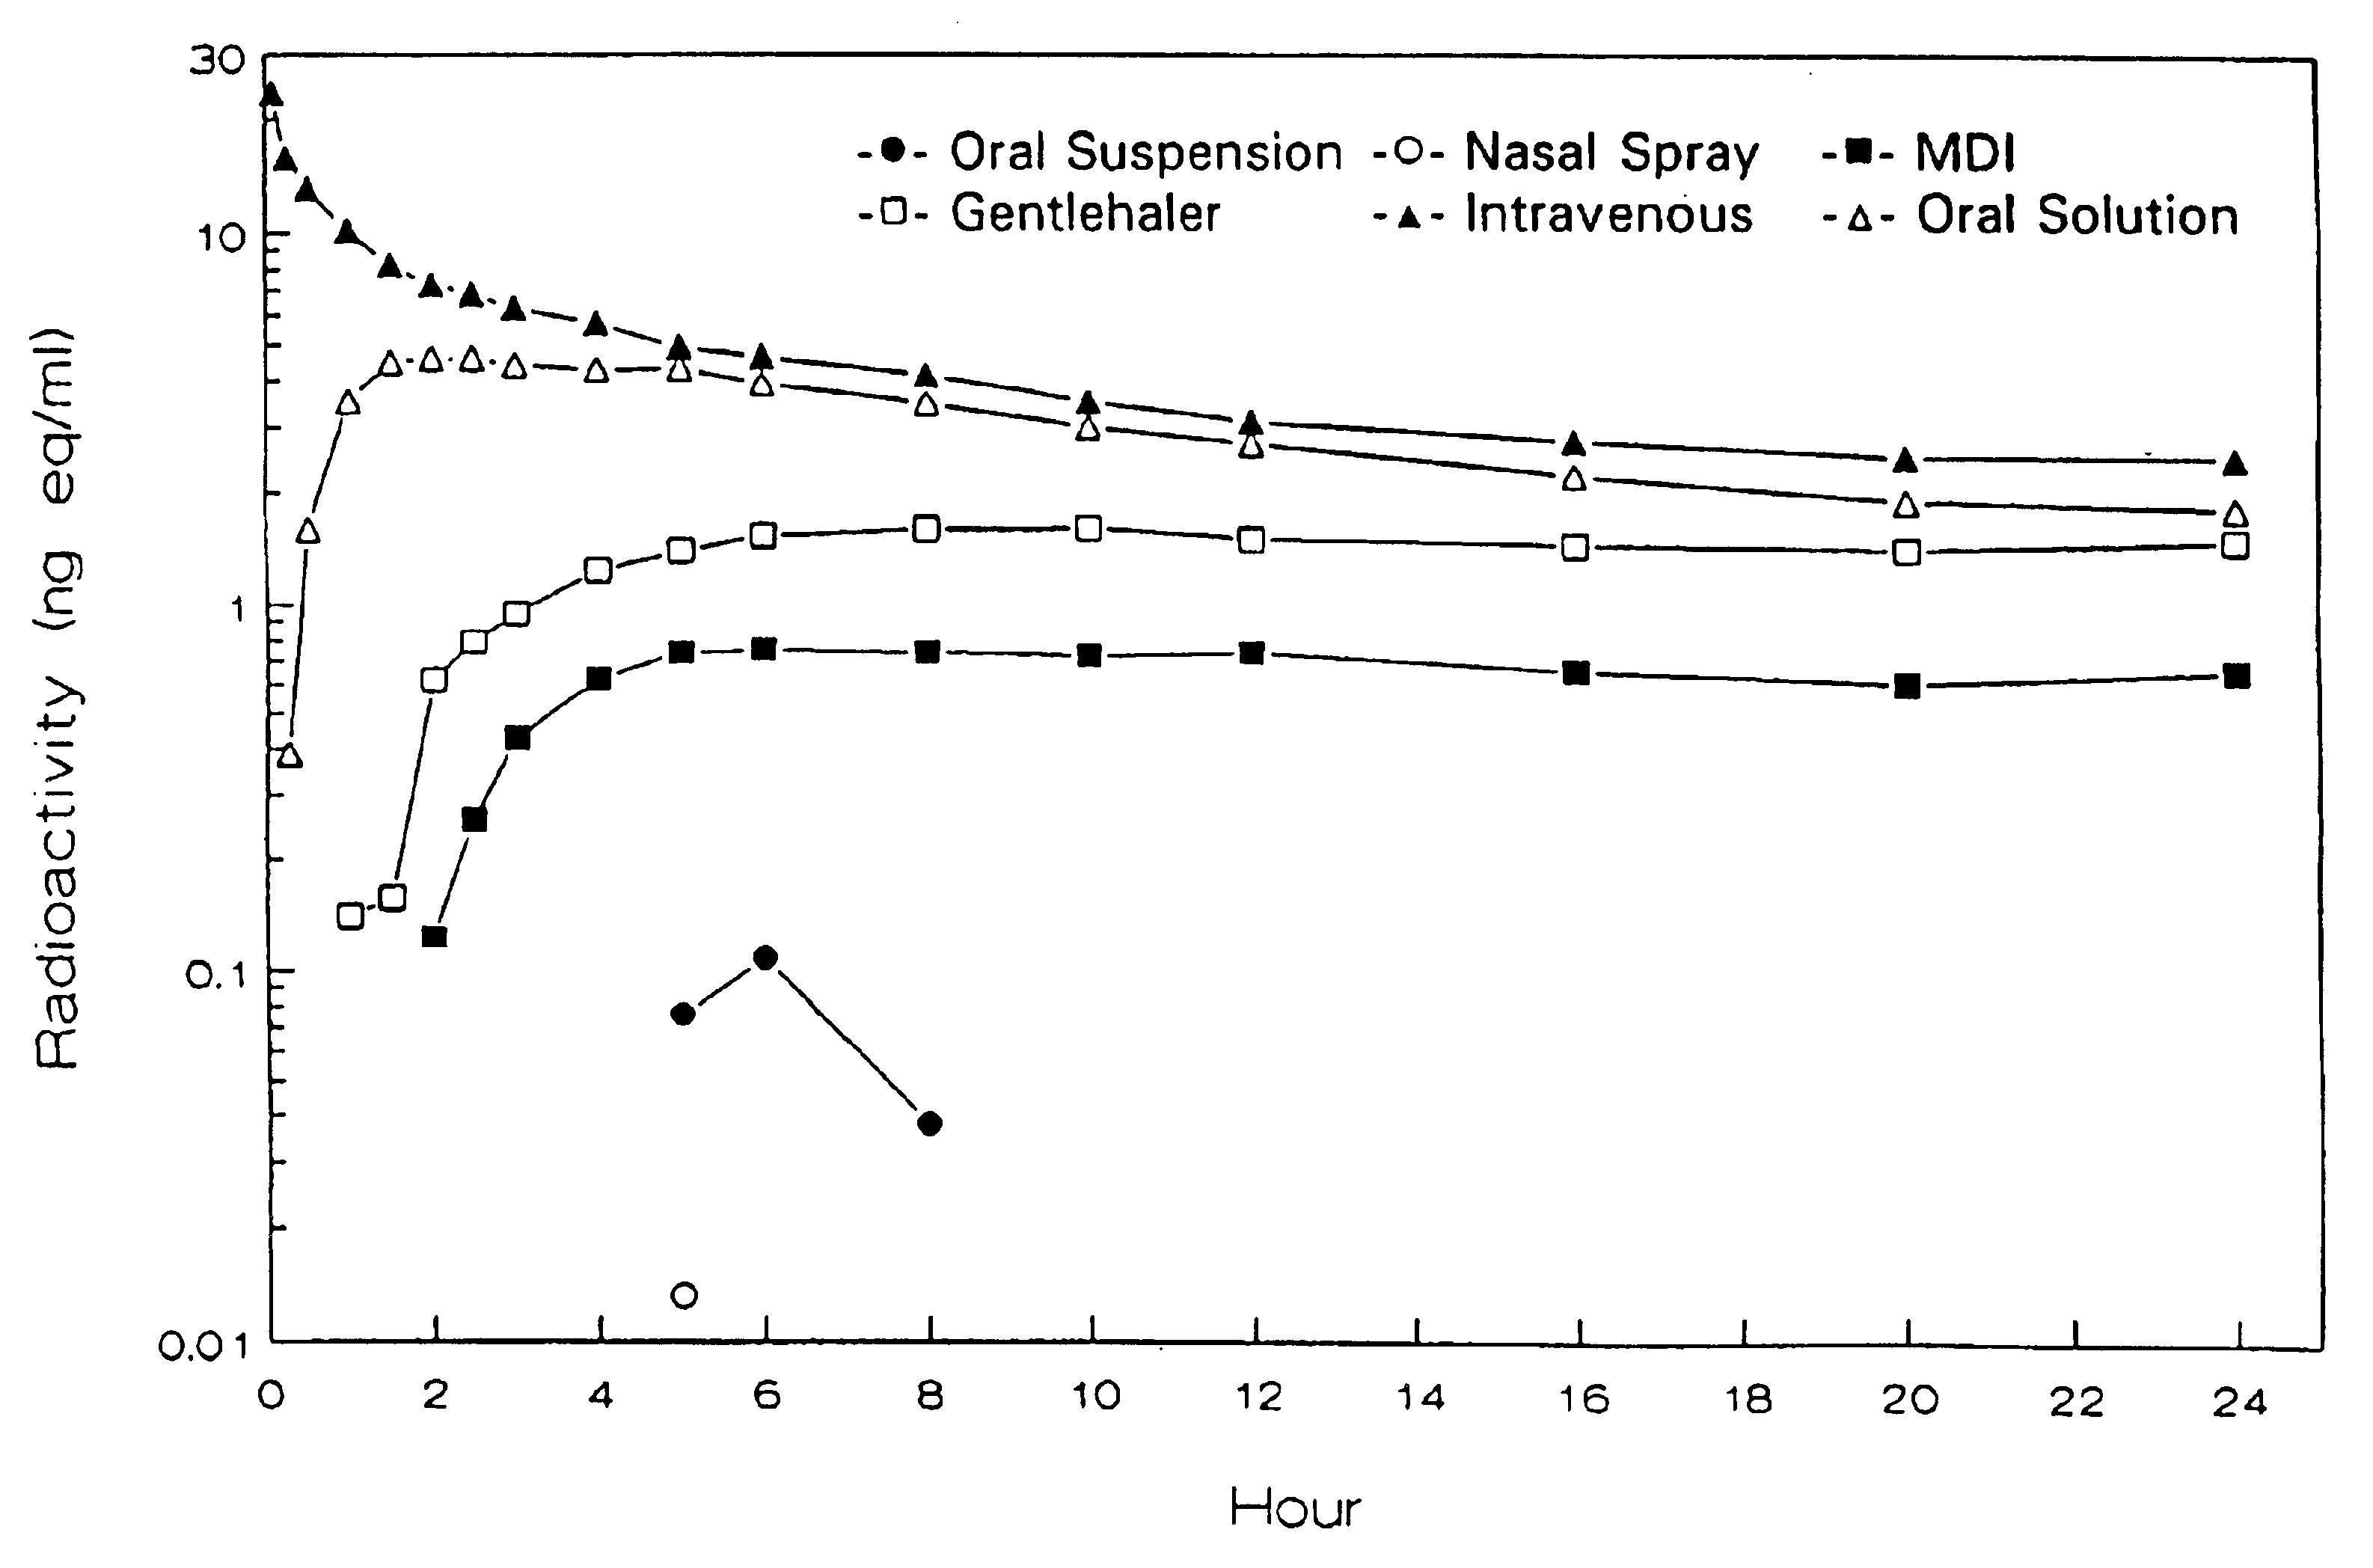 corticosteroid-responsive dermatoses definition